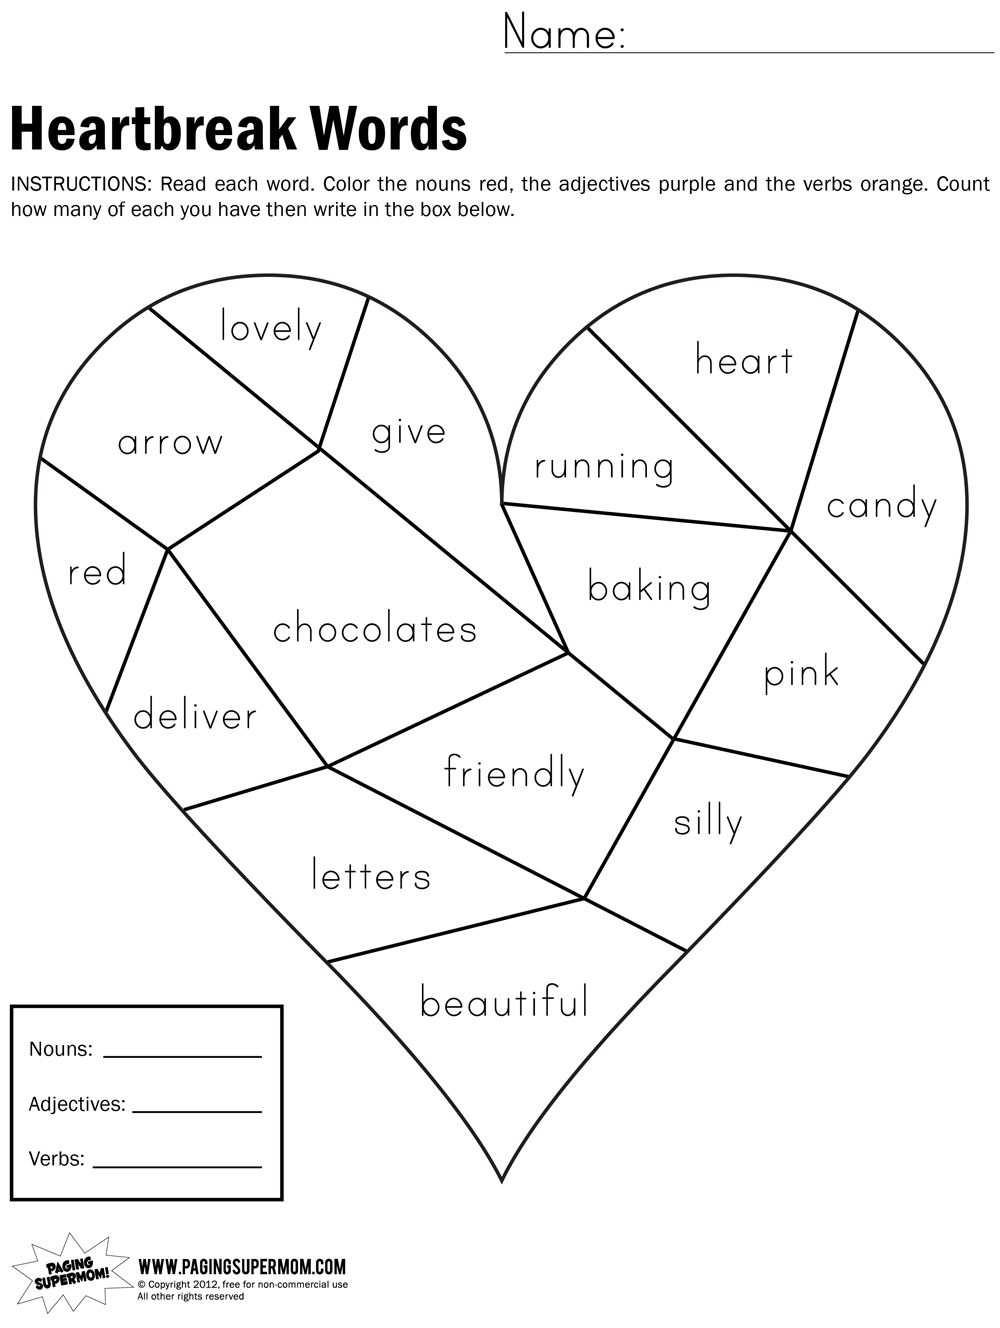 Heartbreak Words Free Printable Worksheet | Education---February | Free Printable Valentine Math Worksheets